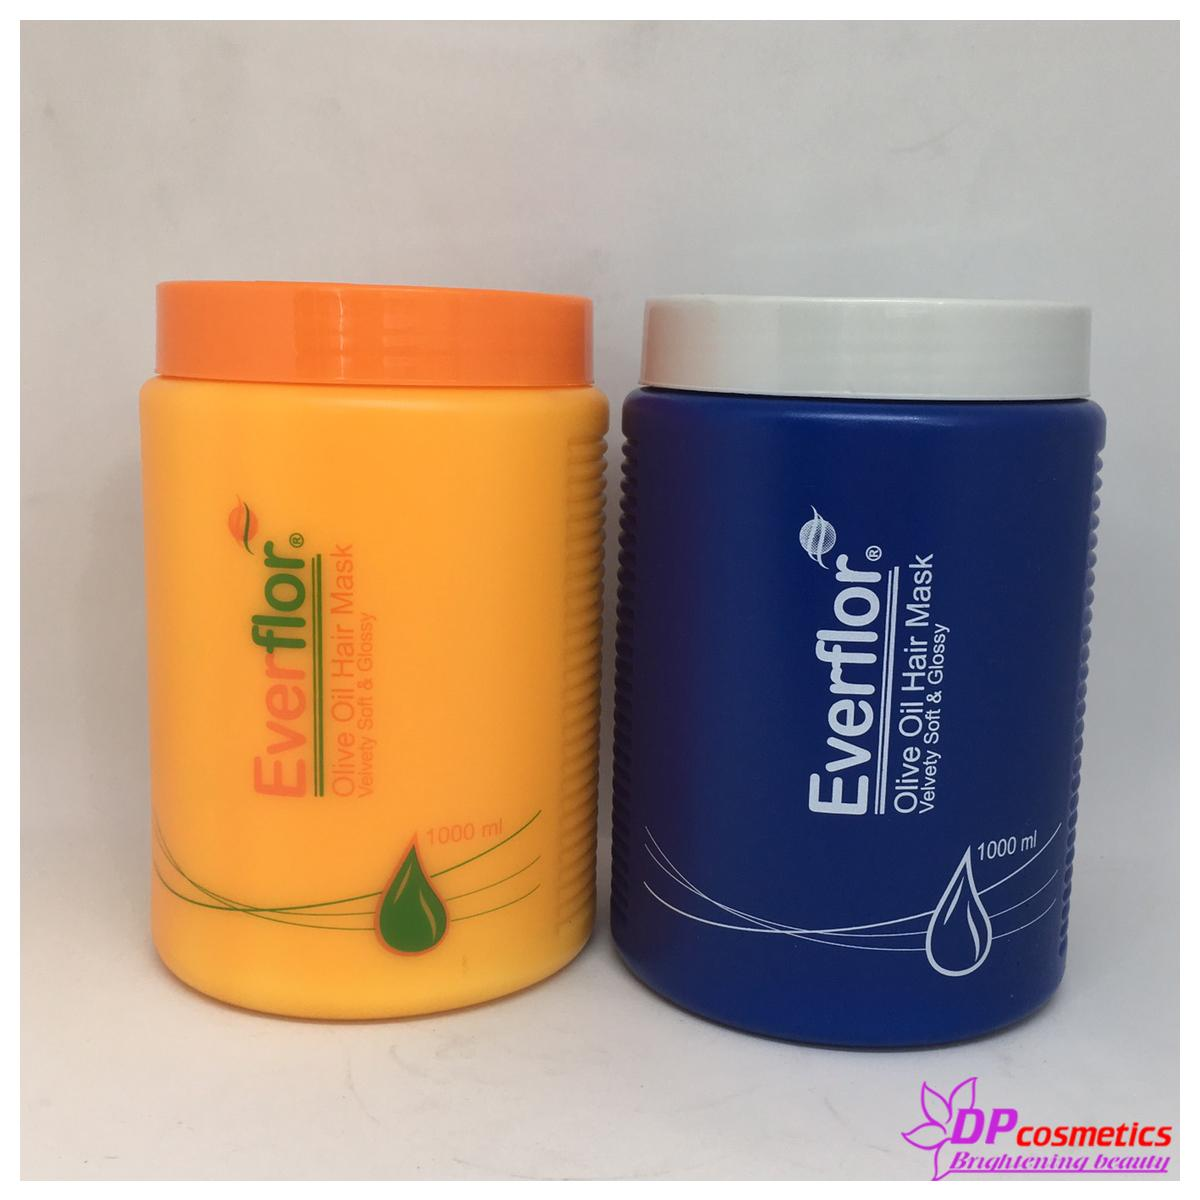 Kem hấp dầu Everflor giá rẻ